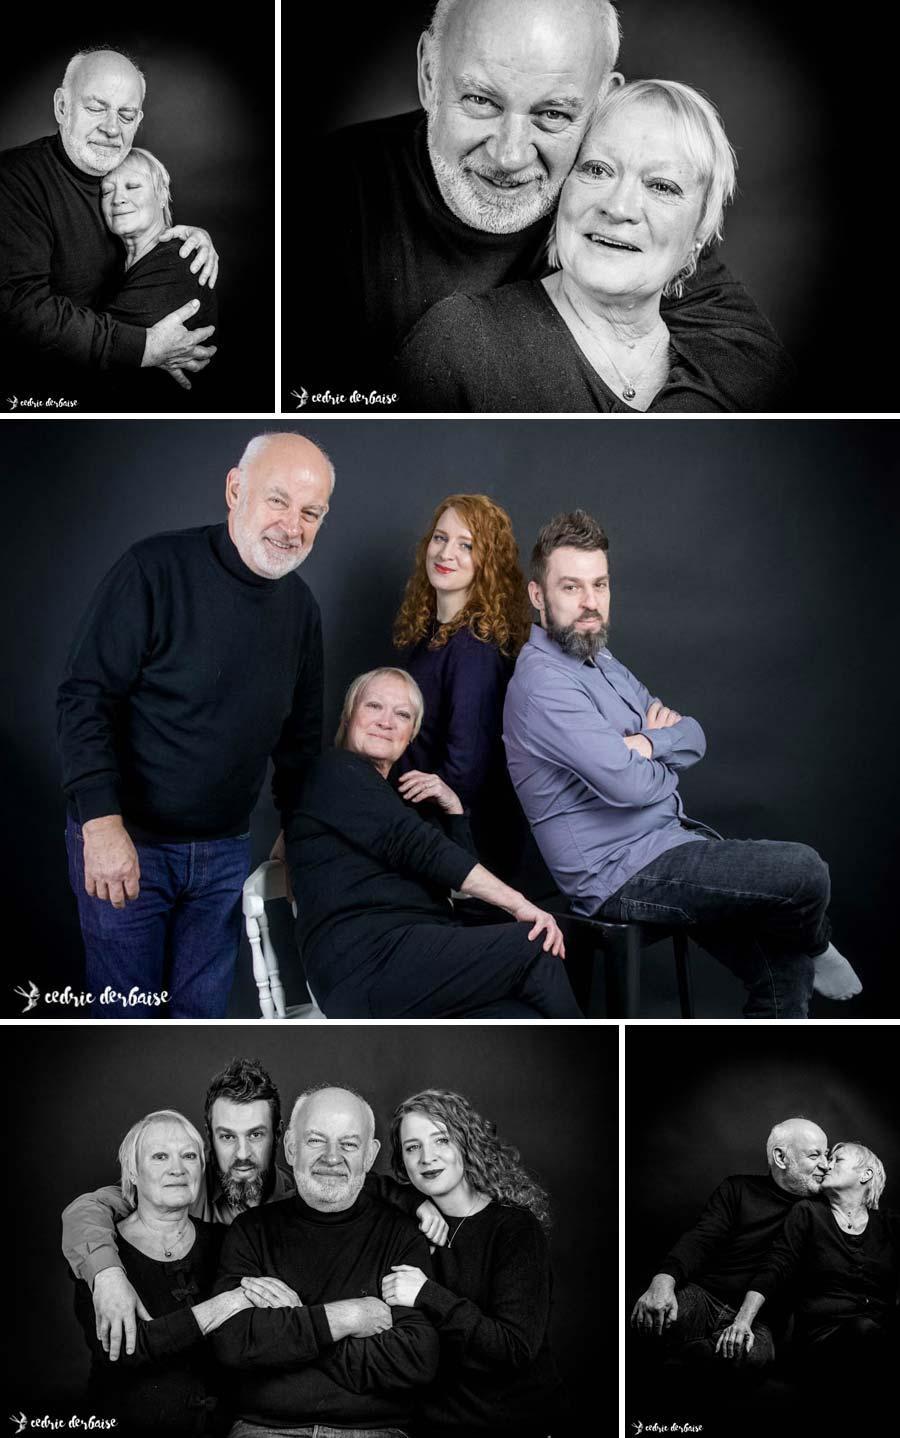 photographe studio famille oise